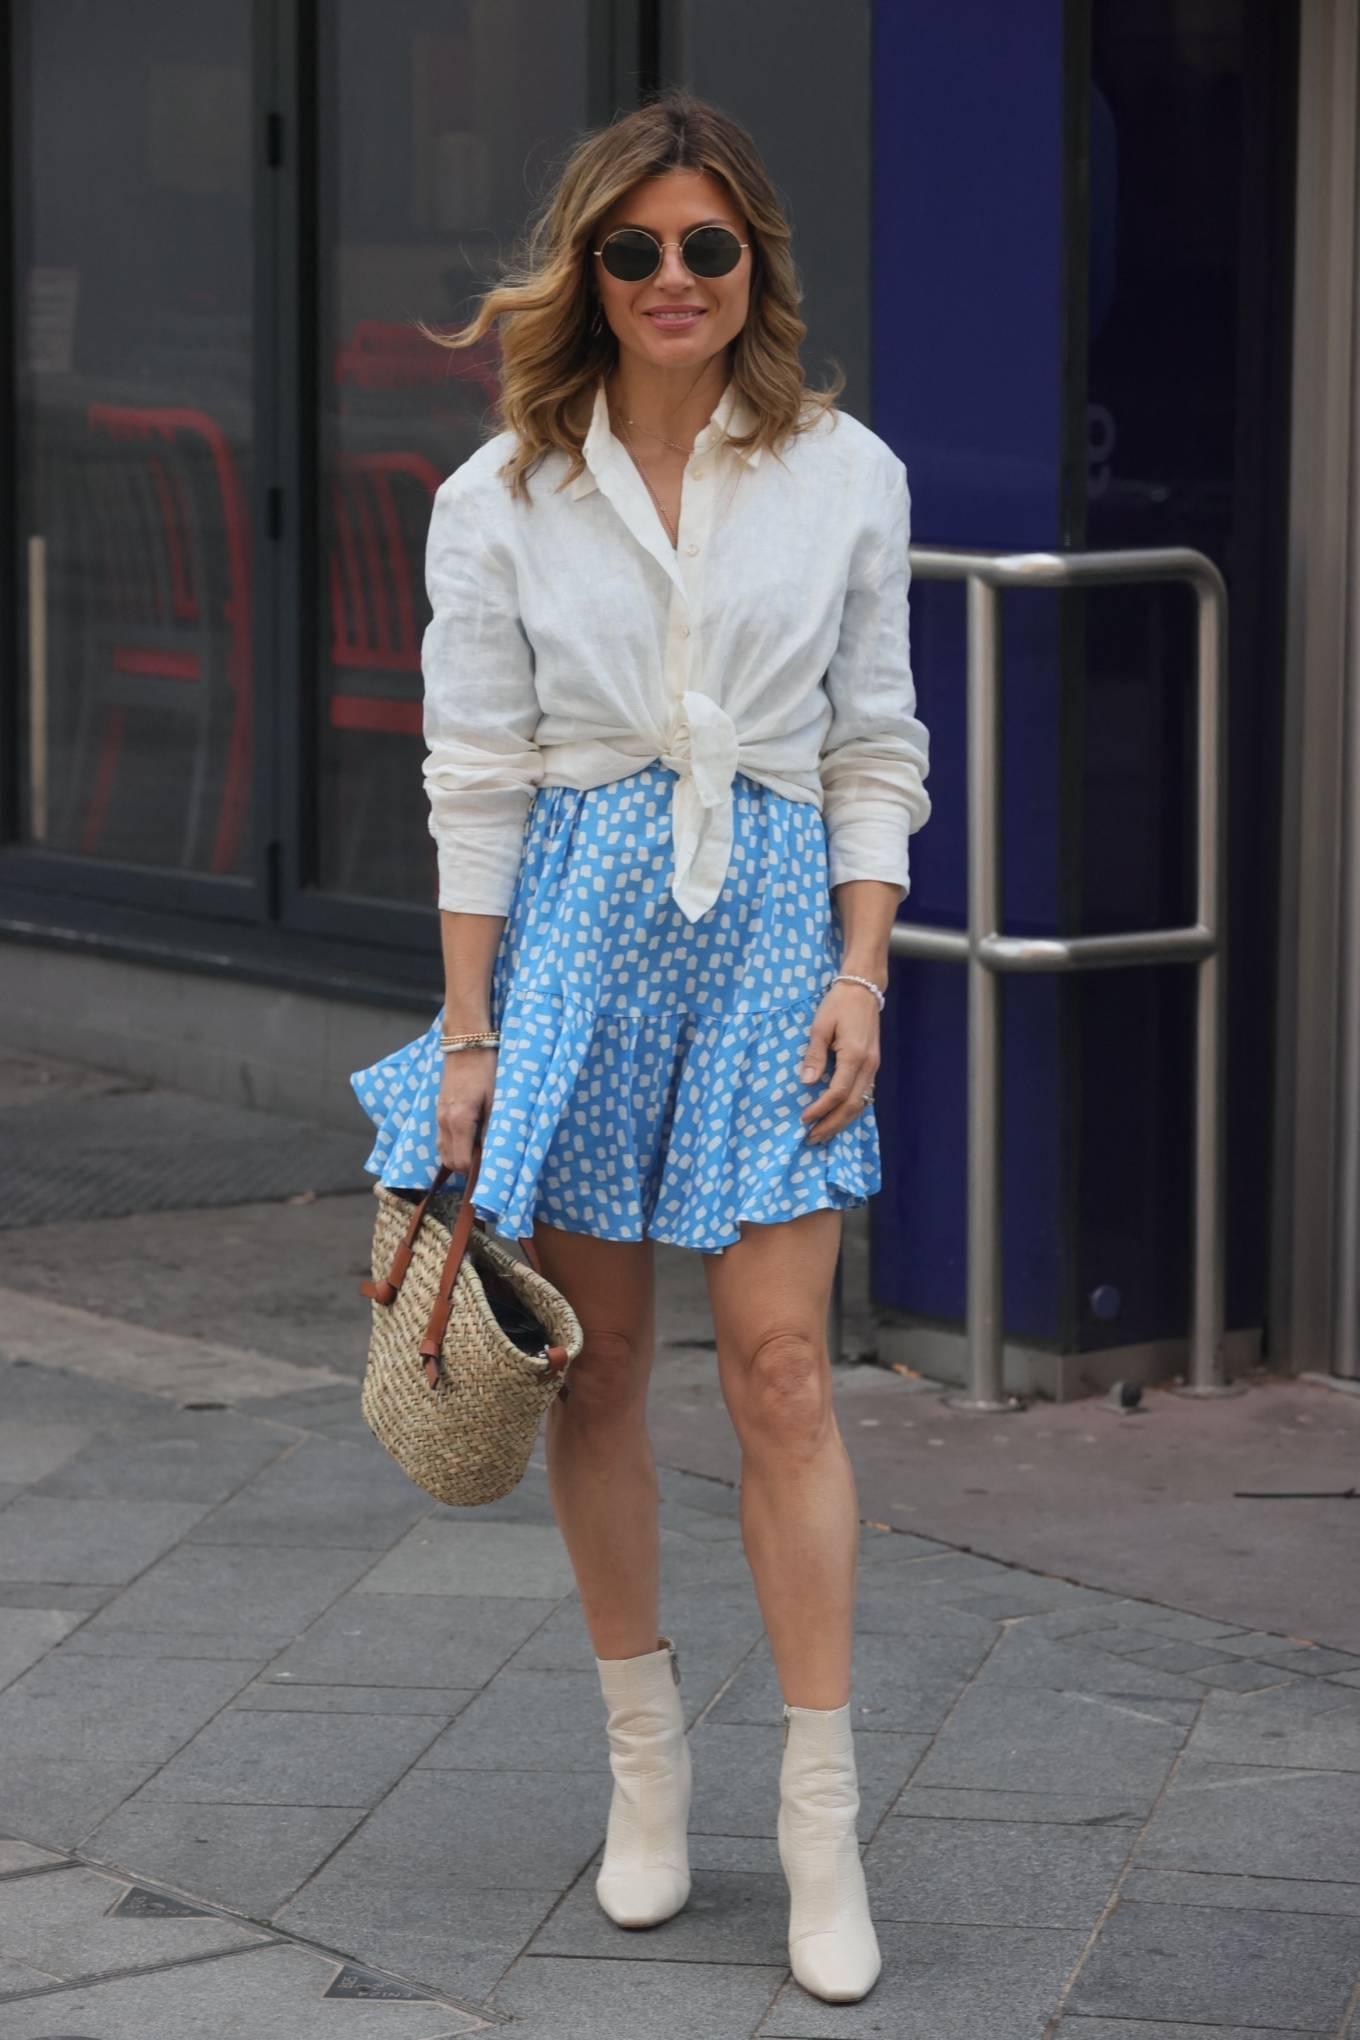 Zoe Hardman- In a mini skirt at heart Radio in London